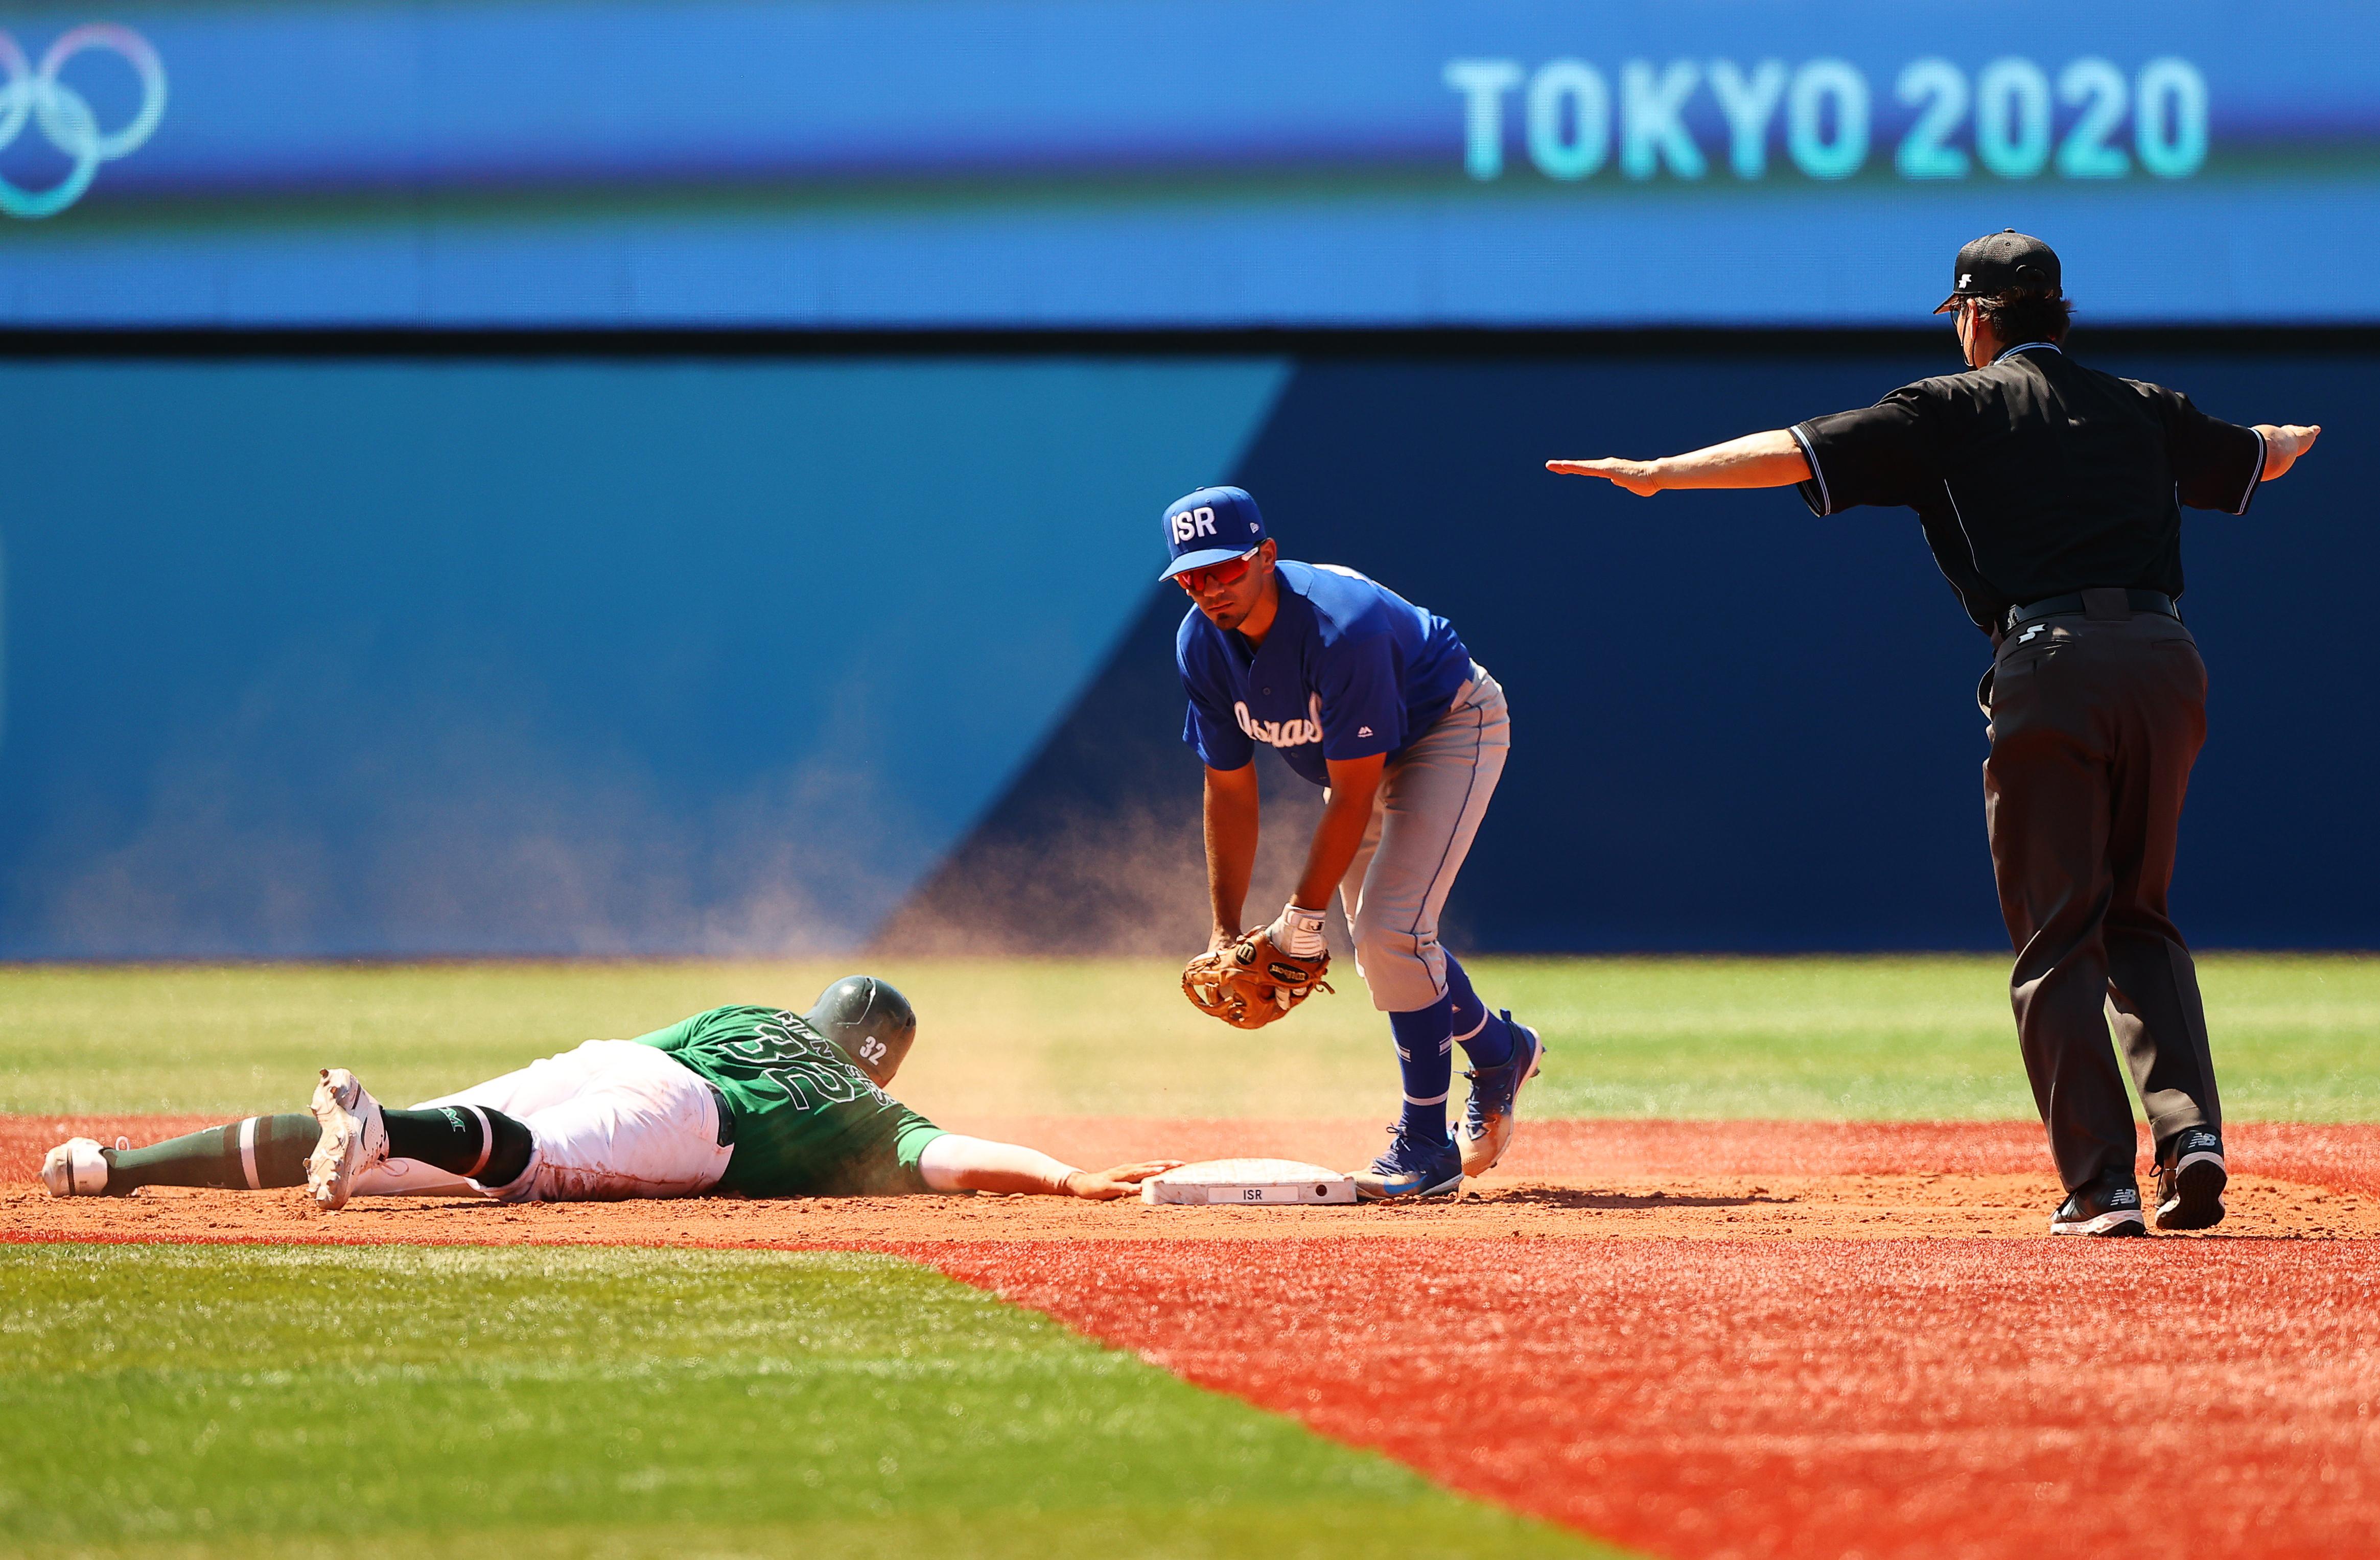 Tokyo 2020 Olympics - Baseball - Men - Knockout Round 1 - Israel v Mexico - Yokohama Baseball Stadium, Yokohama, Japan - August 1, 2021. Joey Meneses of Mexico safe at base, next to Scott Burcham of Israel. REUTERS/Jorge Silva